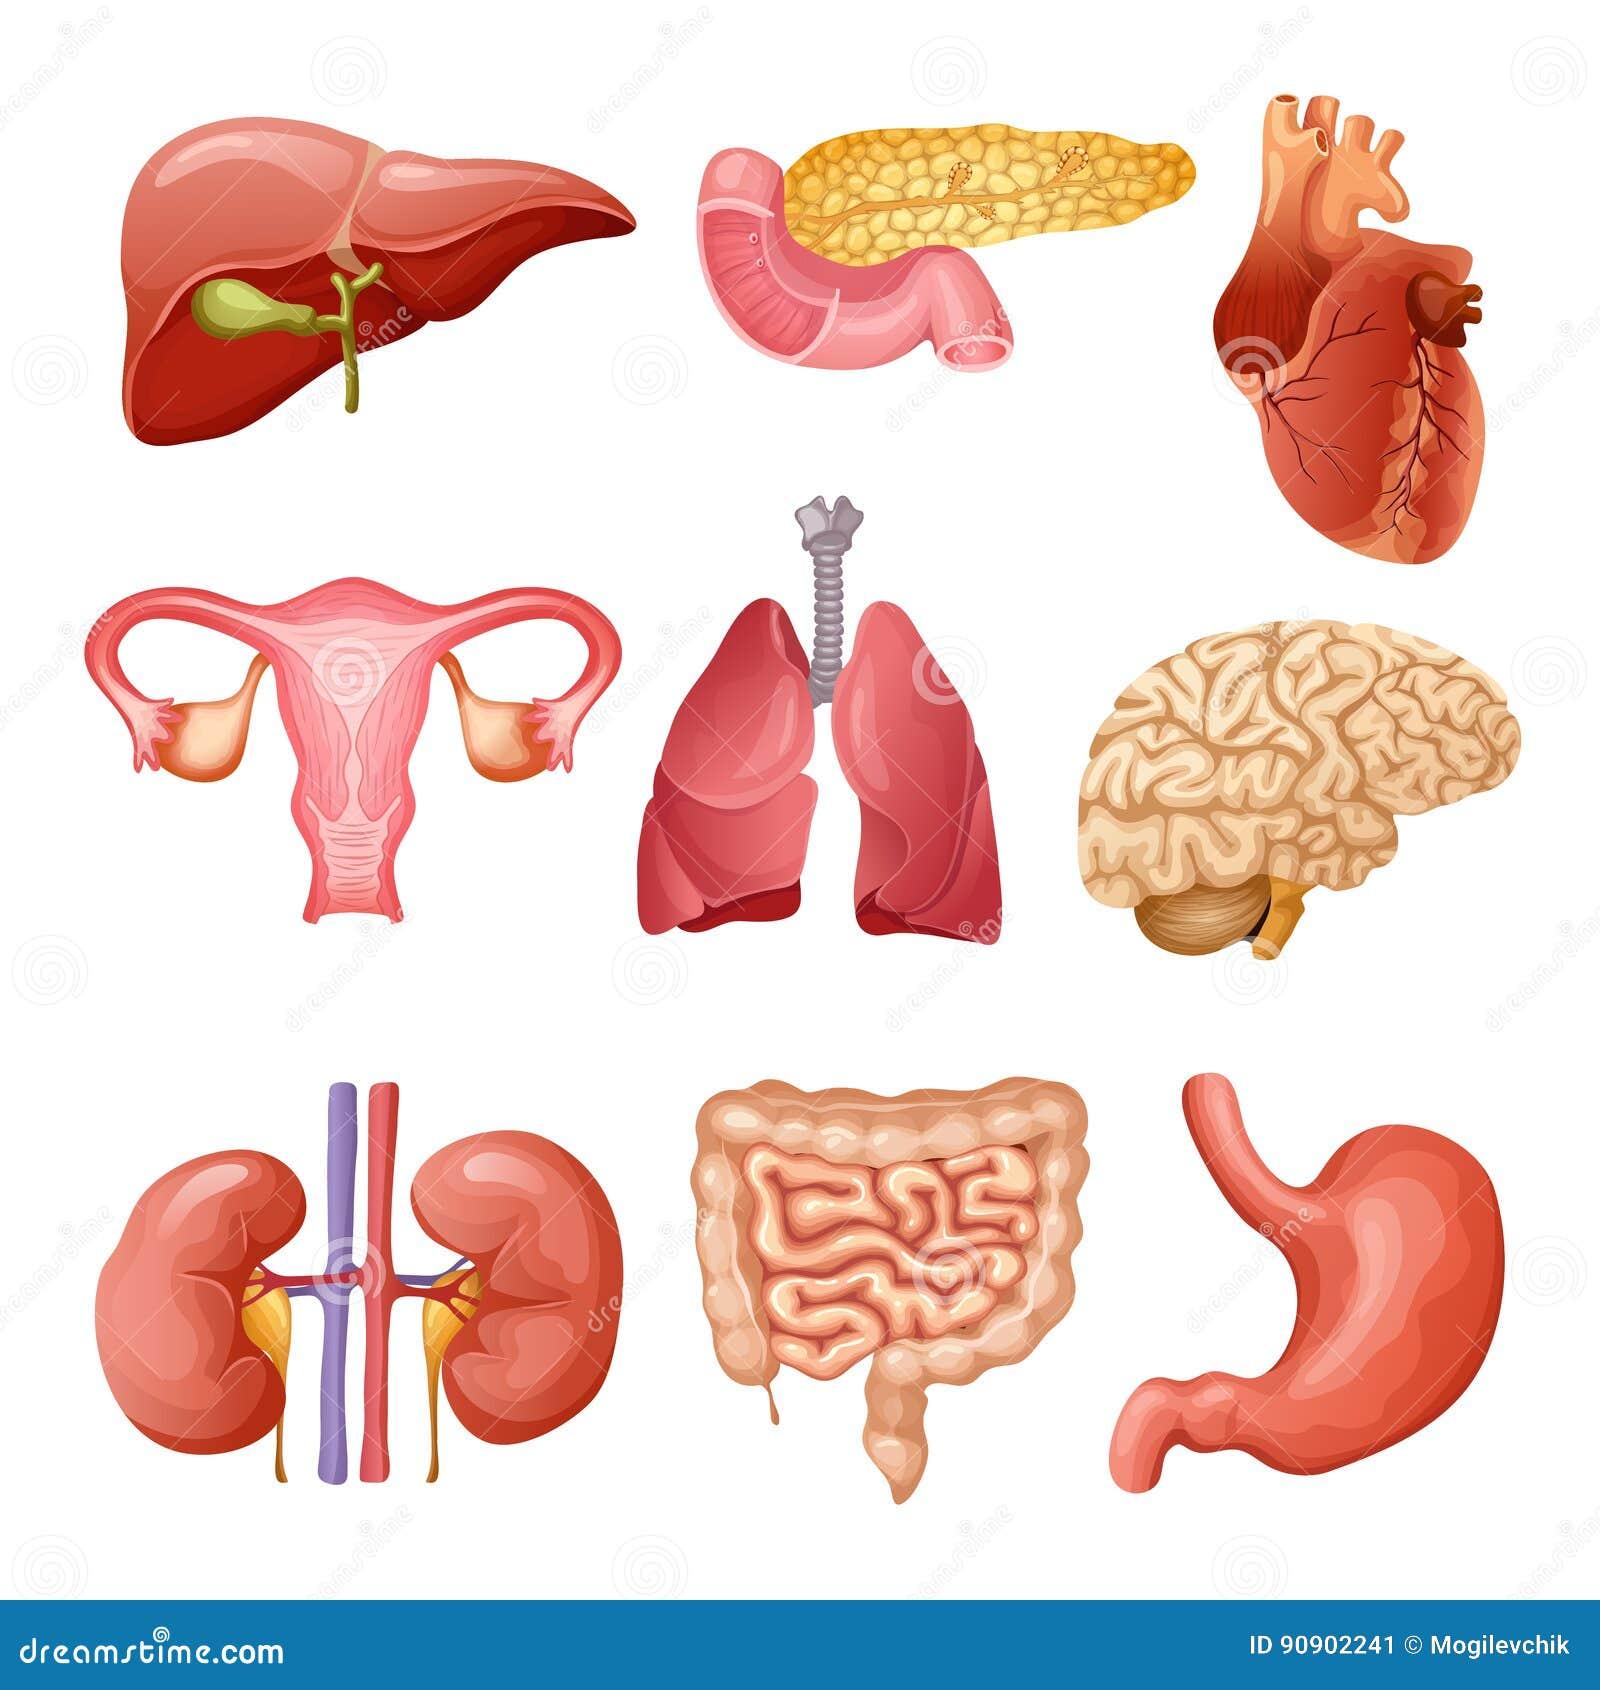 Cartoon Human Organs Set Stock Vector Illustration Of Healthy